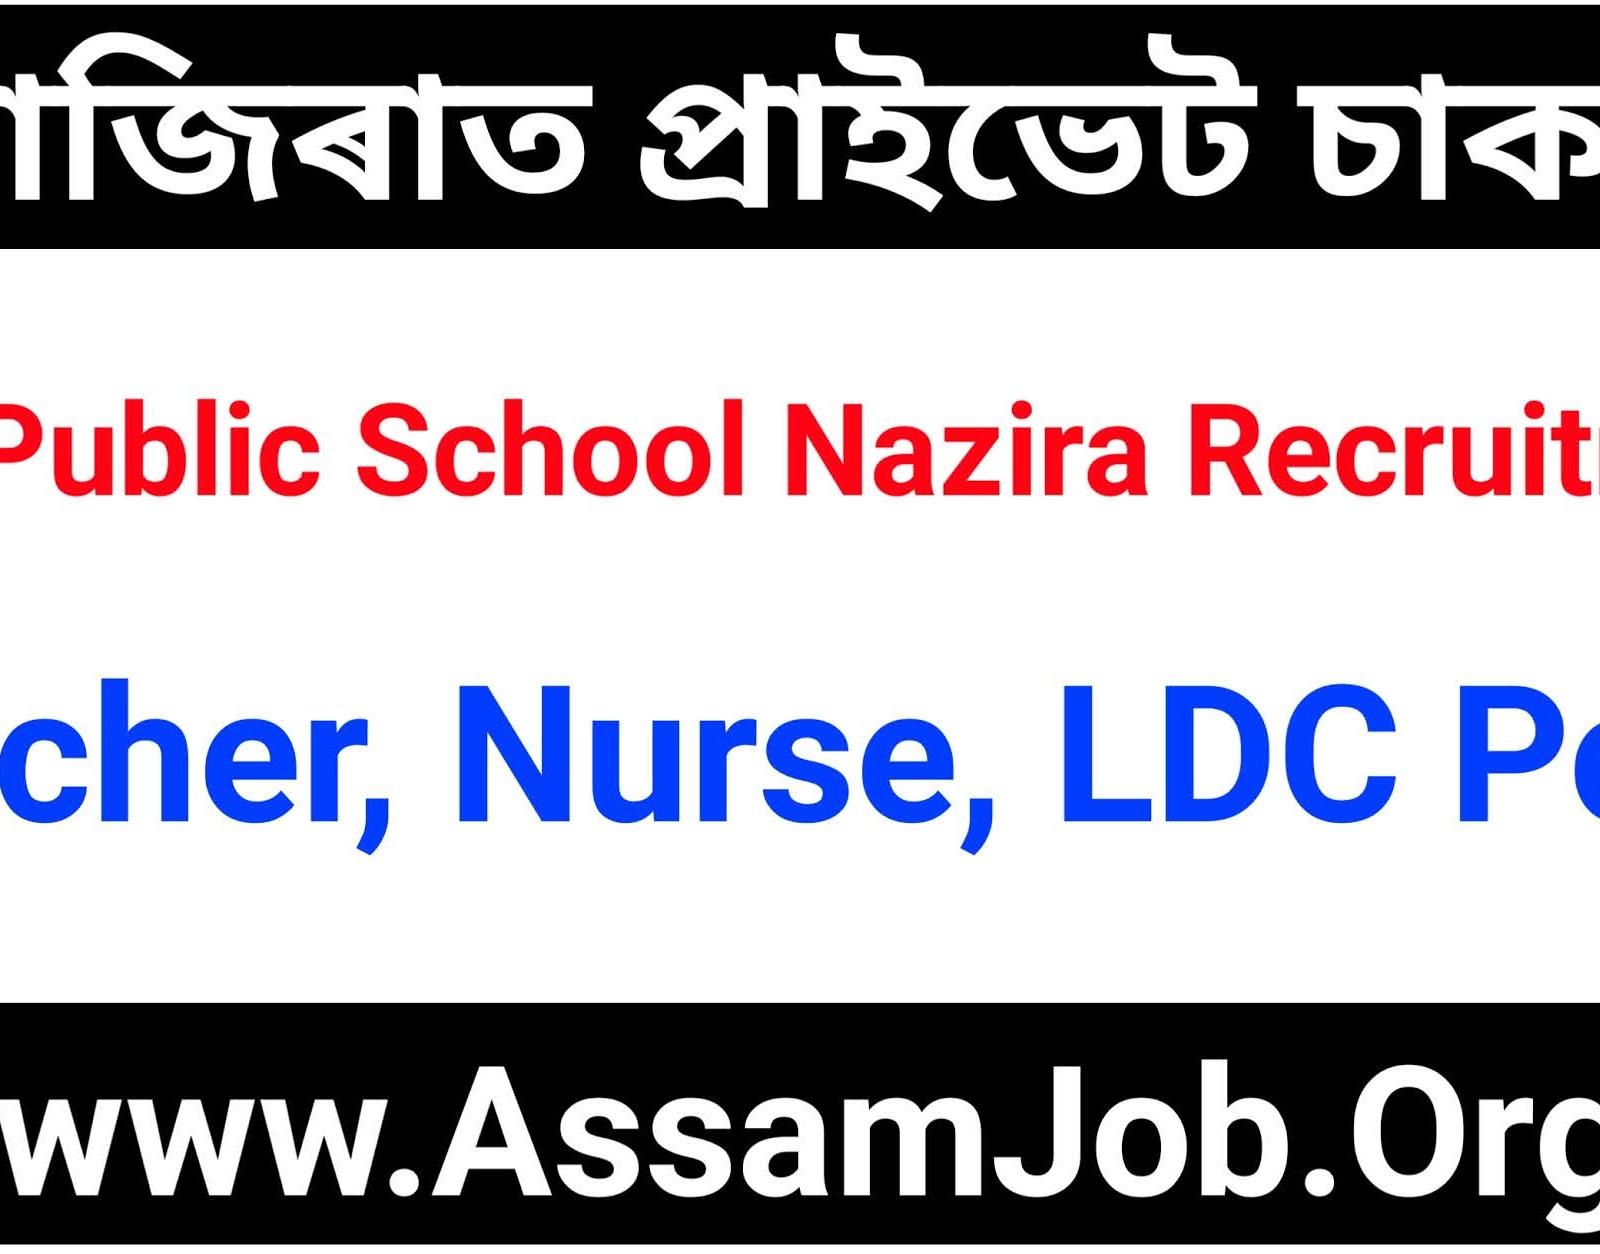 Delhi Public School Nazira Recruitment 2021 - Apply for Teacher, Nurse, LDC Post